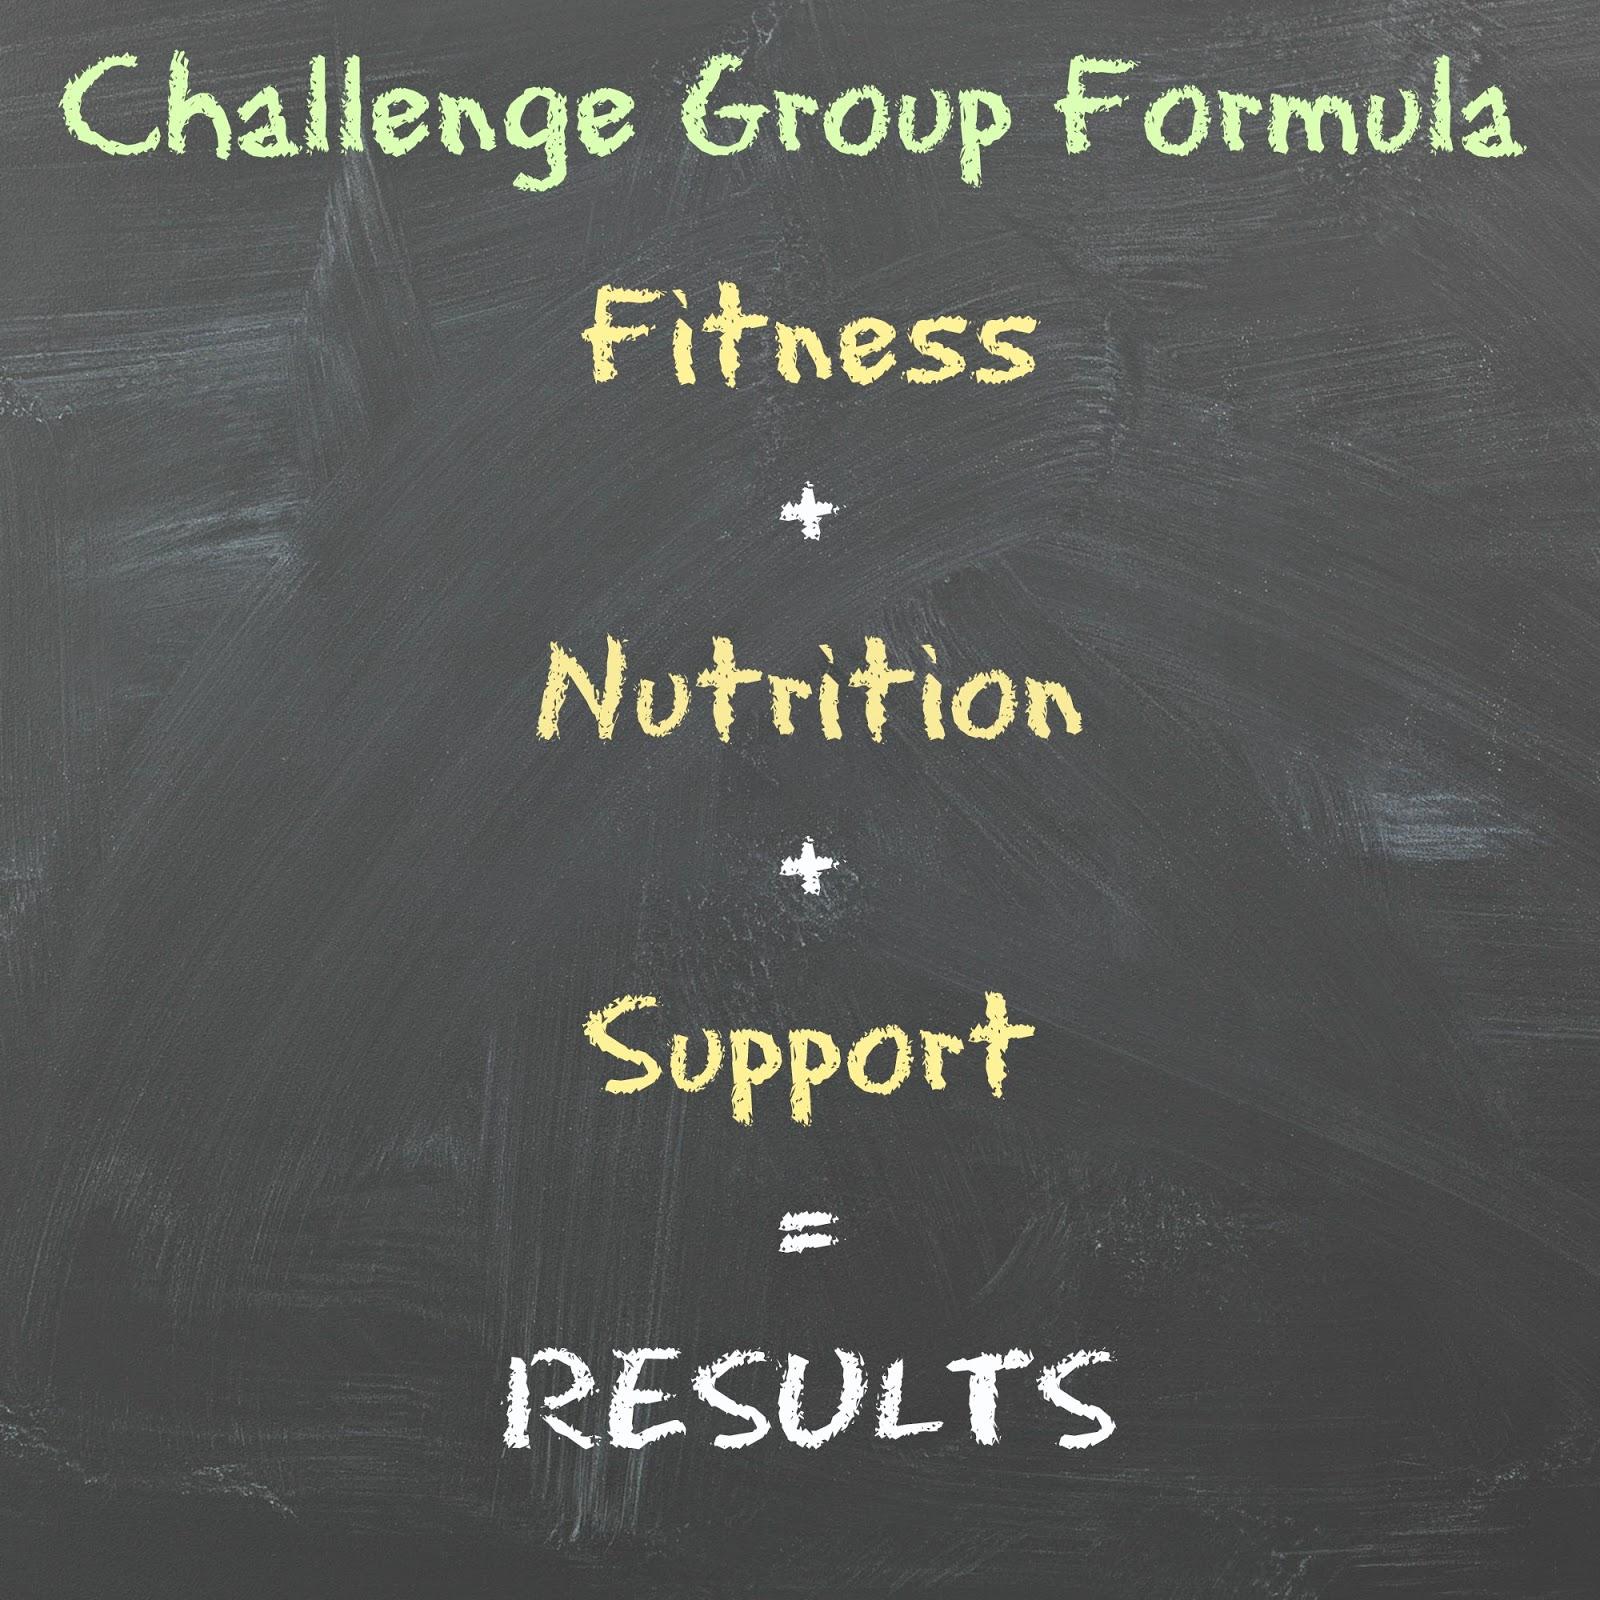 90 day fitness challenge plan